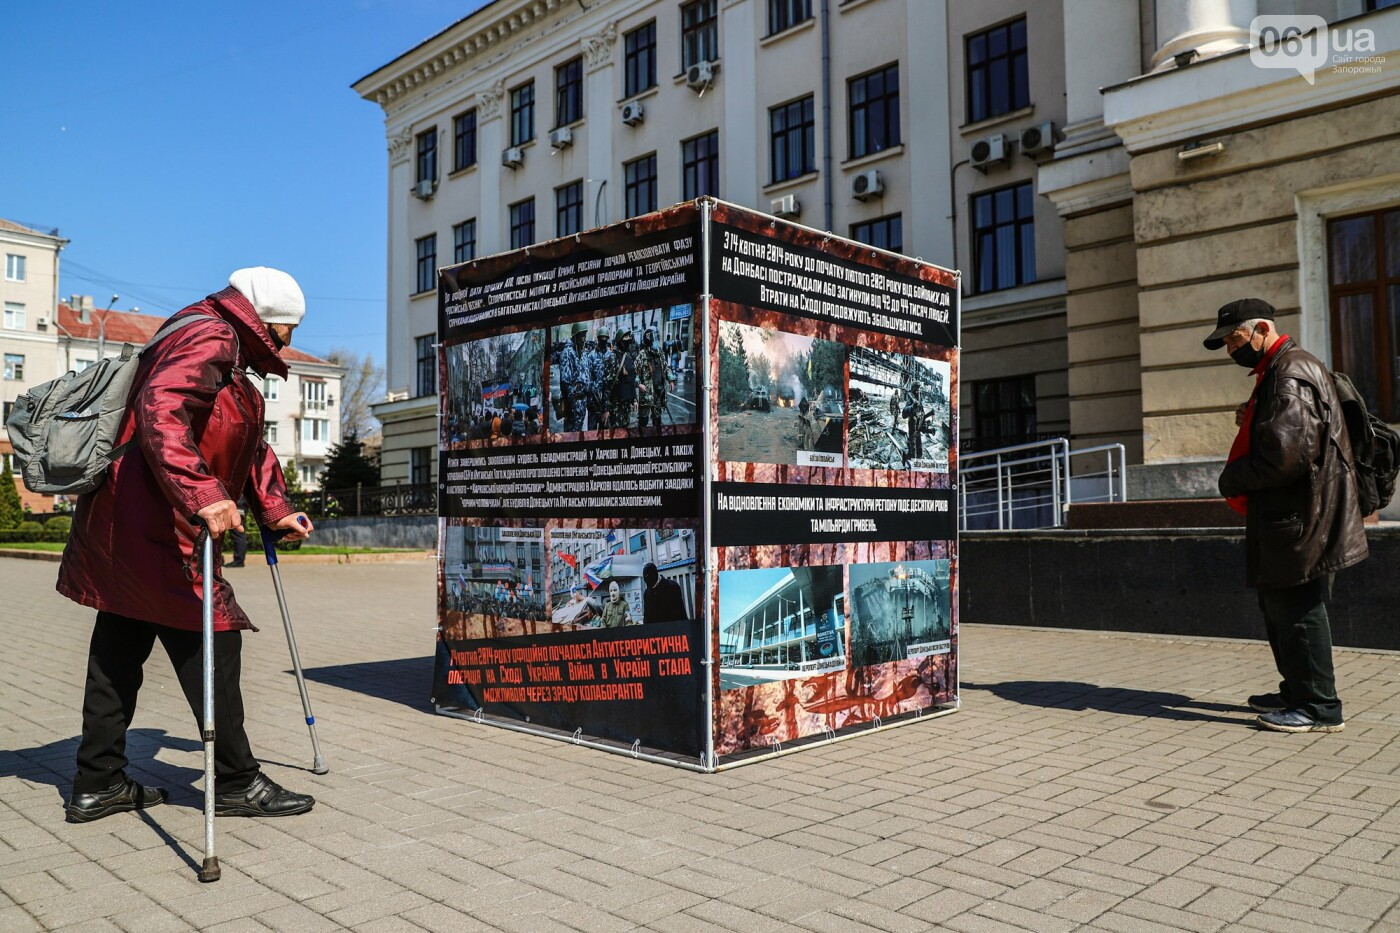 В Запорожье возле мэрии установили стенды с портретами Медведчука и Шария, - ФОТО, фото-11